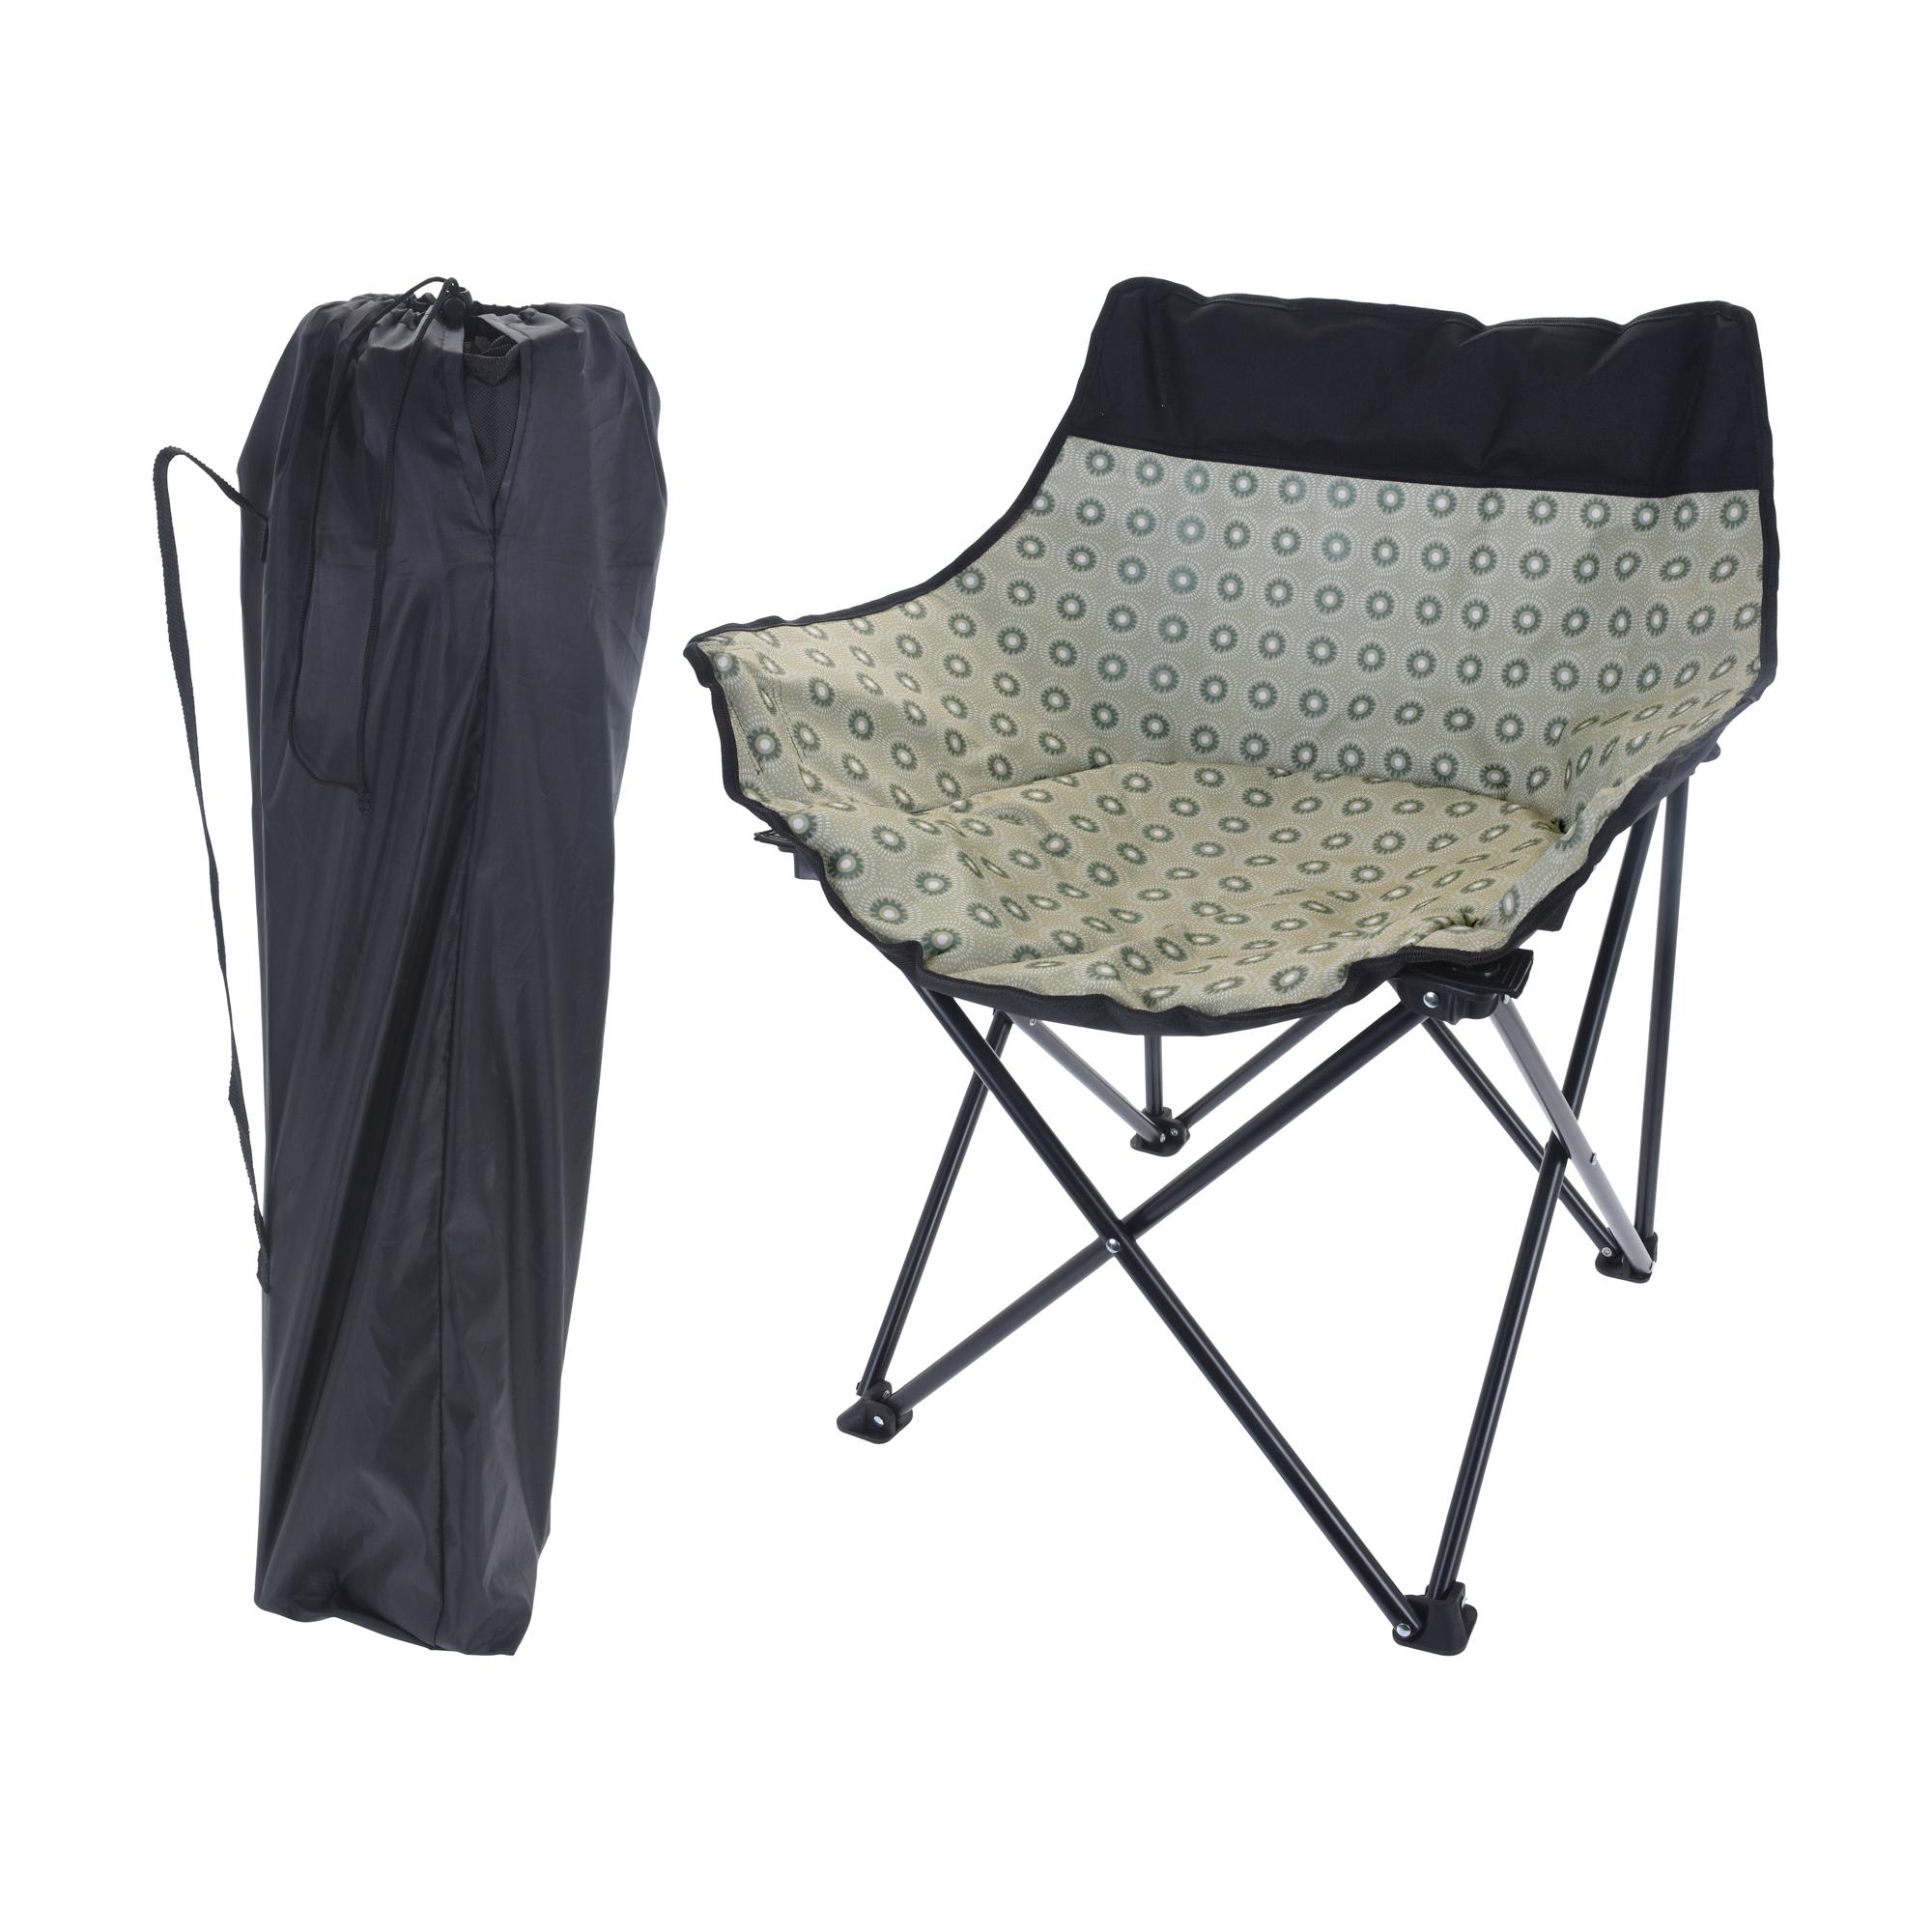 Кресло Ambiance Camping Koopman X25000130 зеленое кресло camping world dreamer класса premium blue